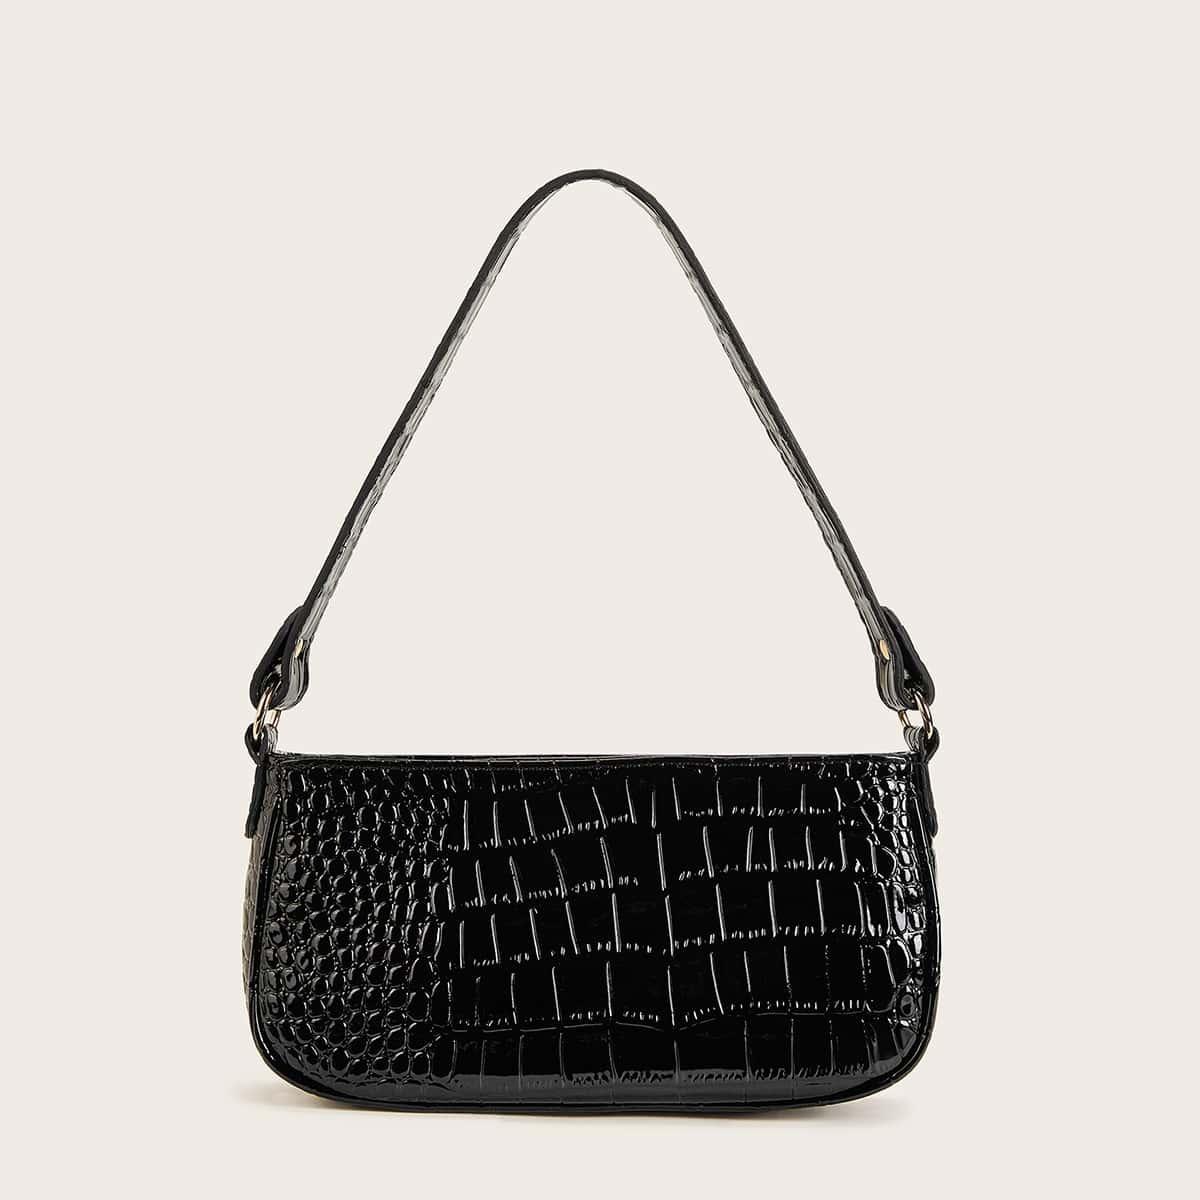 Багетная сумка с тиснением под крокодила